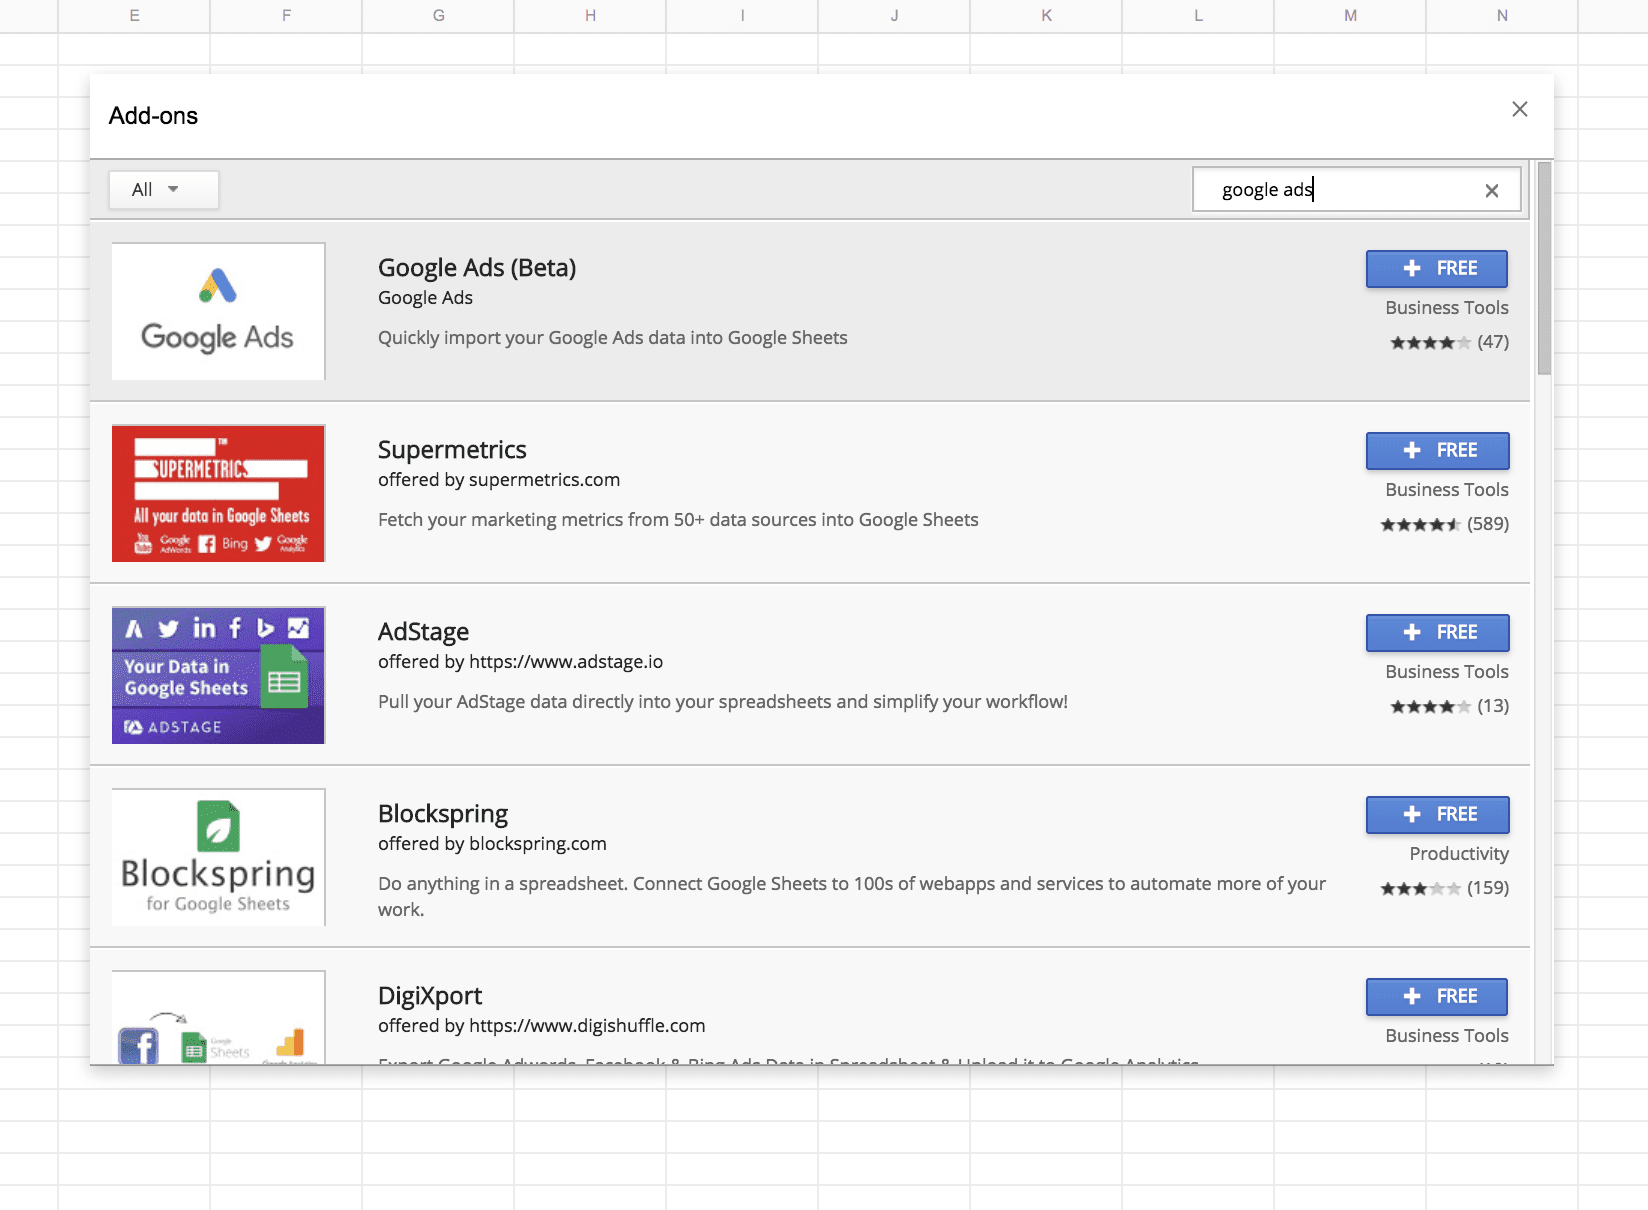 Google Ads add-on